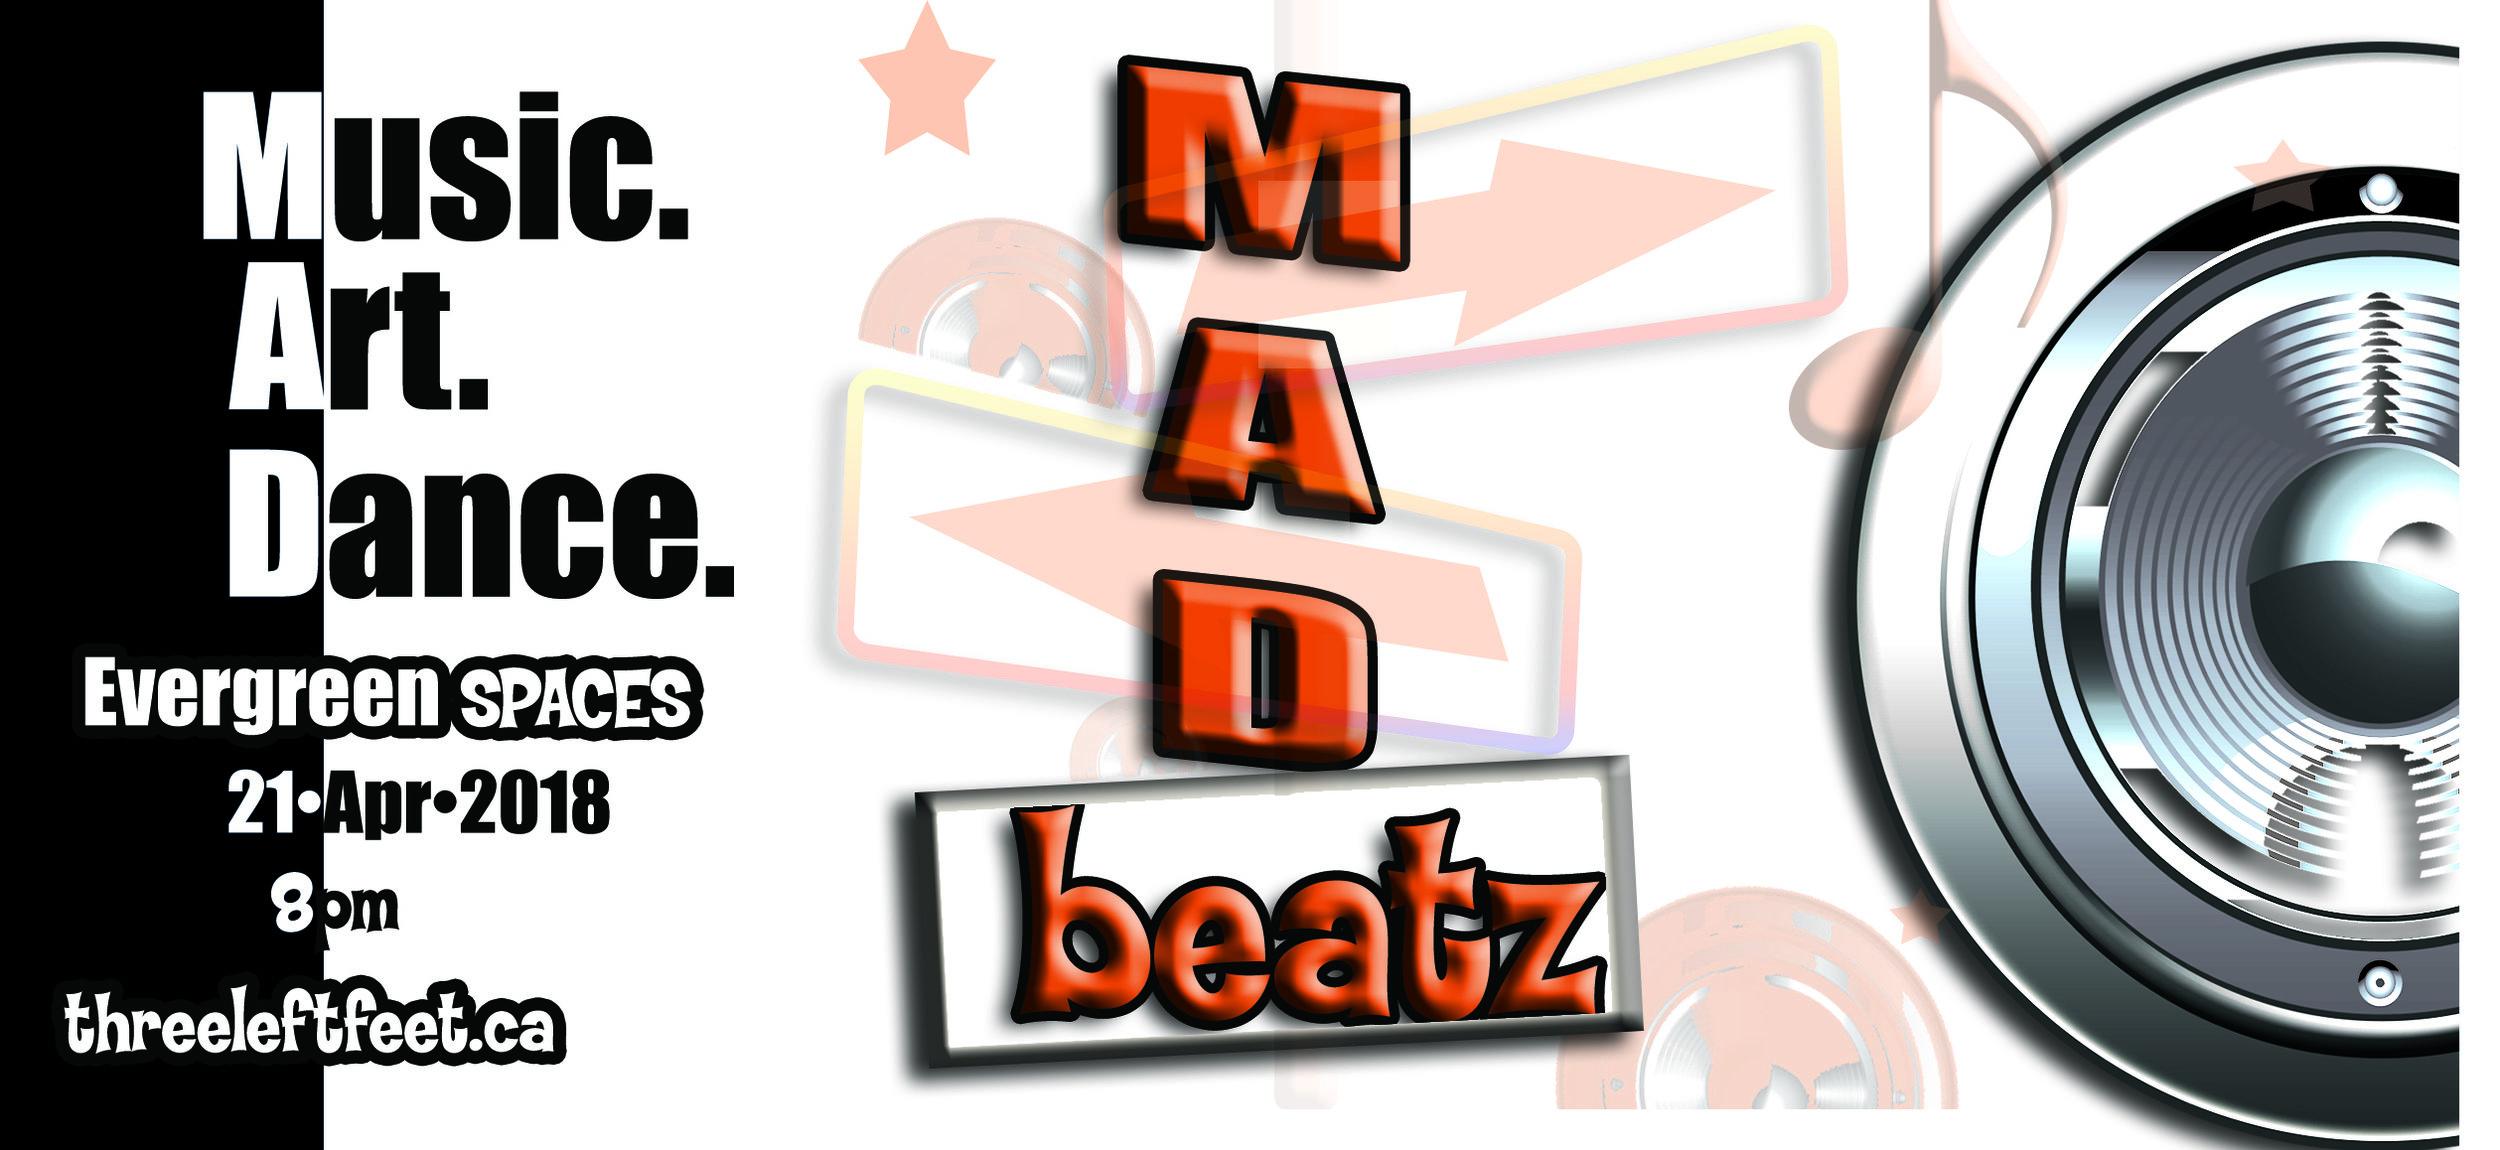 MADbeatz_FB_ReVised.jpg